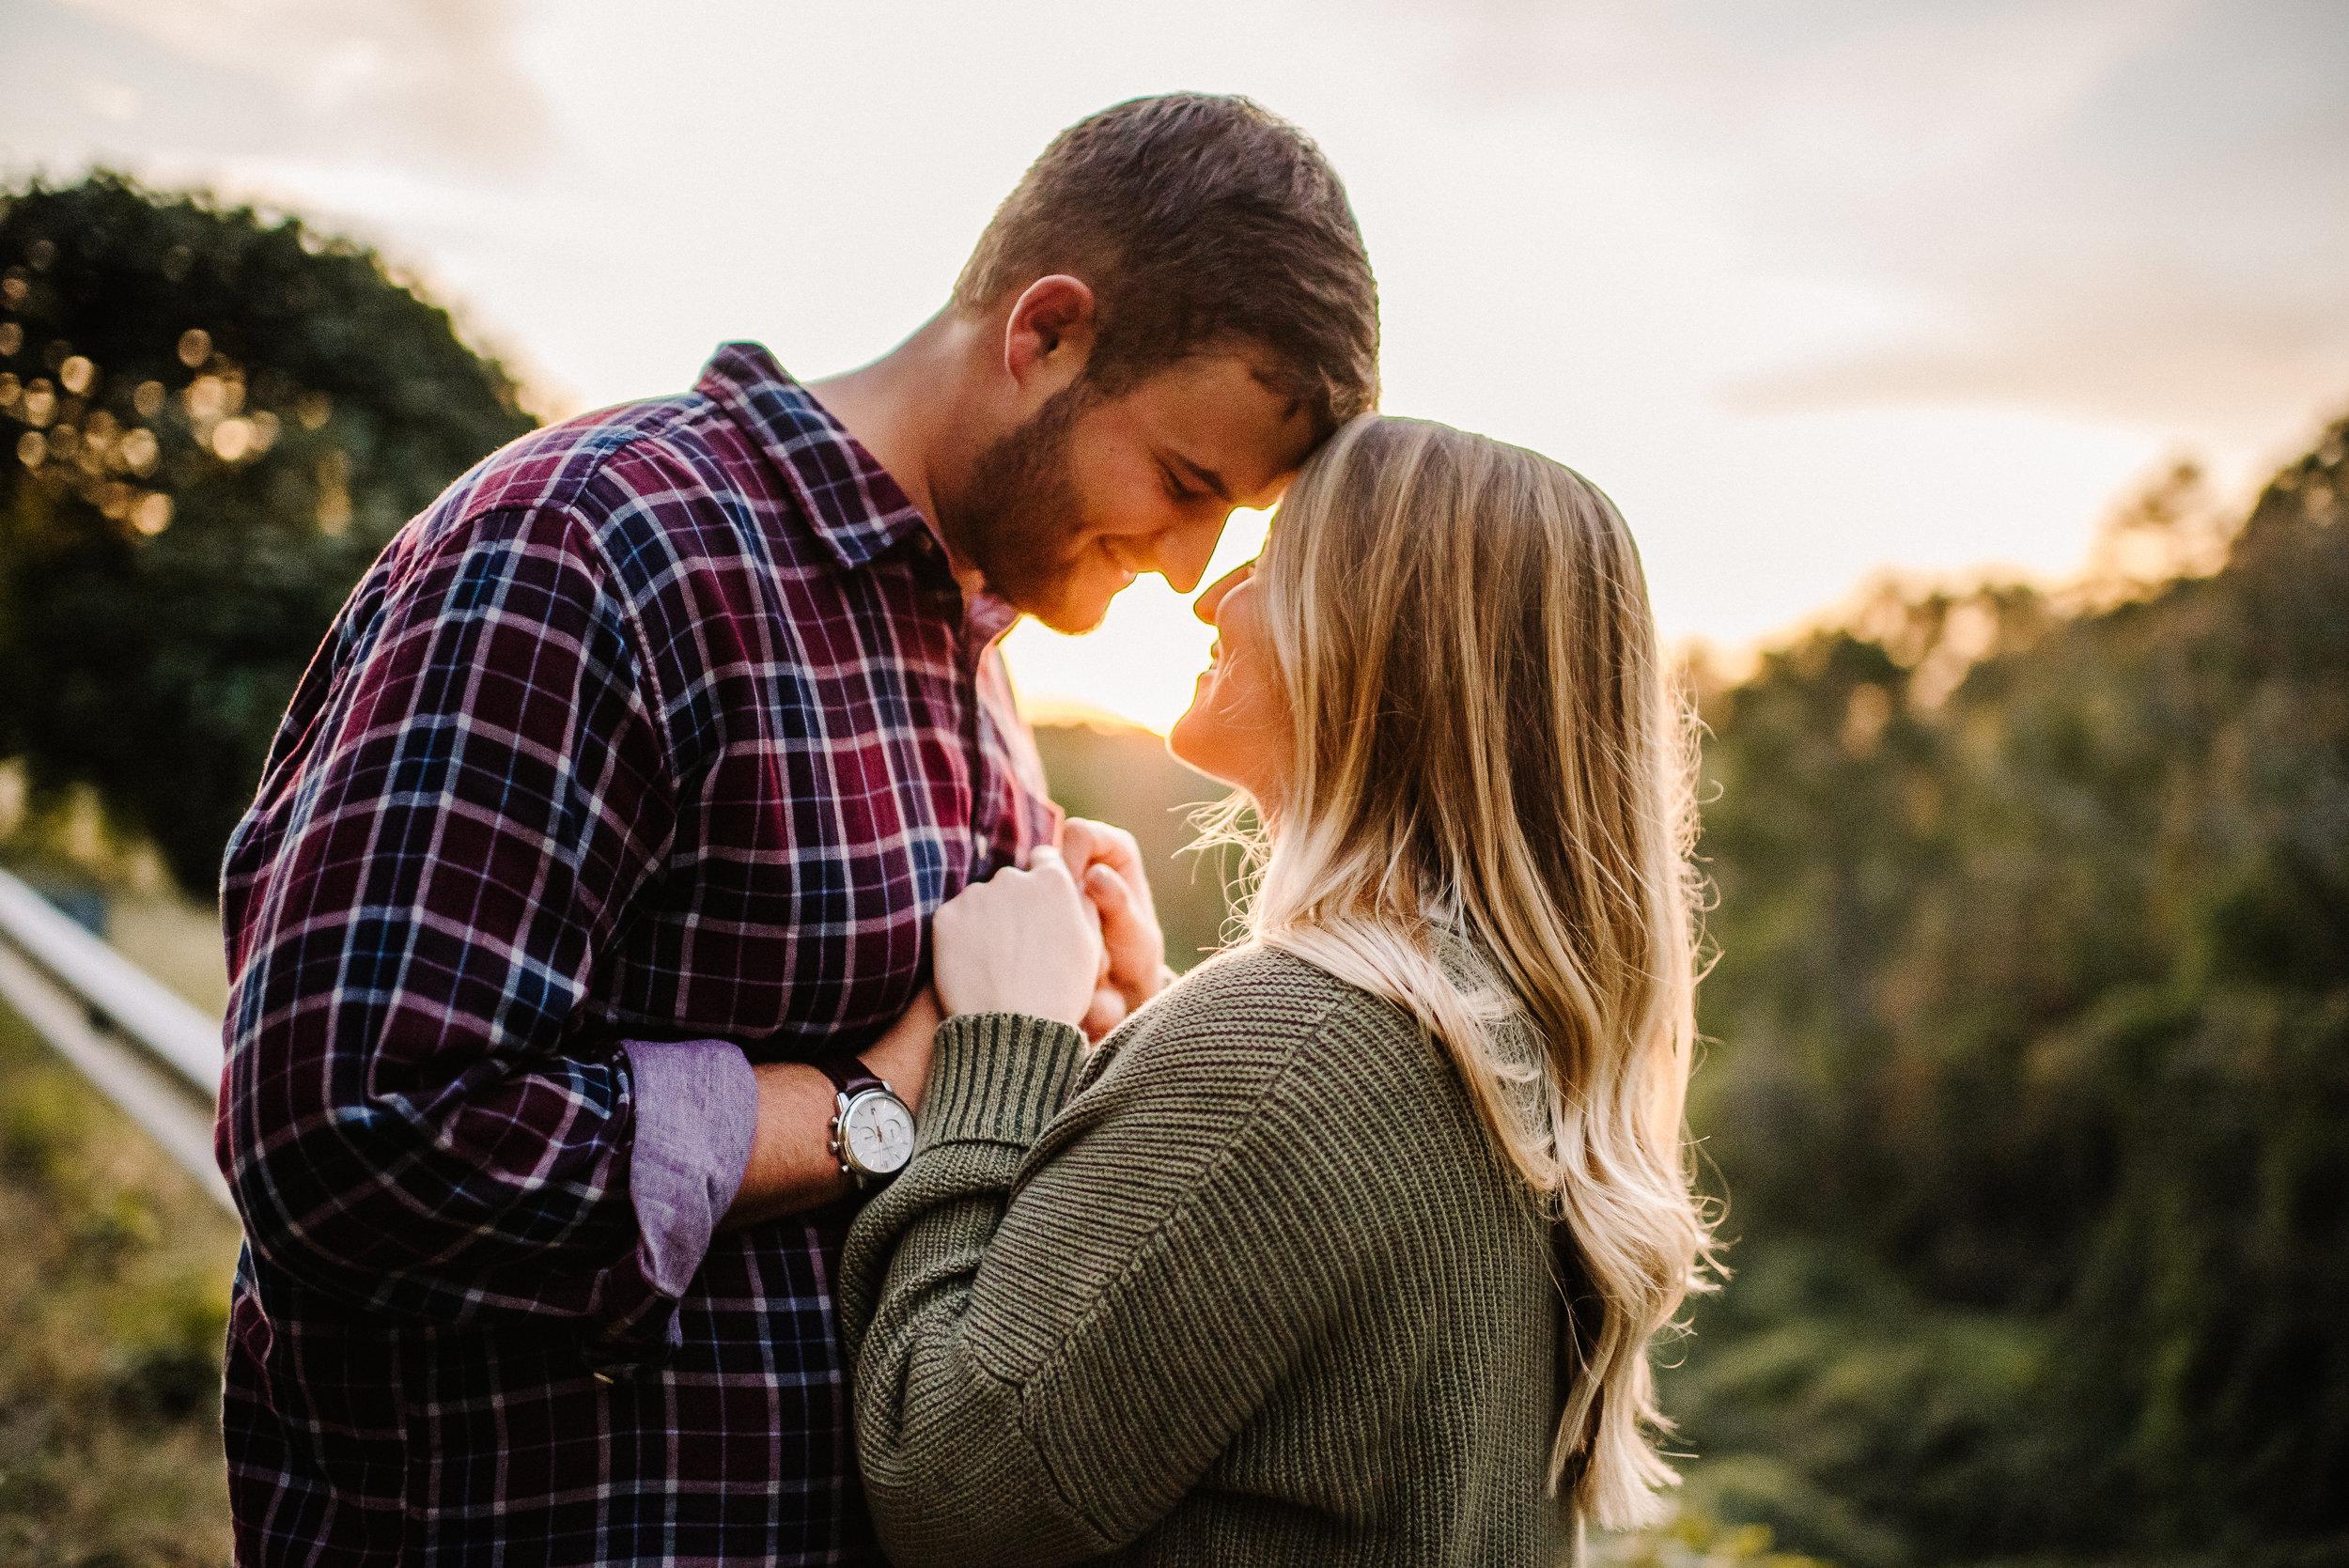 Romantic Fall Engagement Photography_Alexis & Jacob_Ashley Benham Photography-182.jpg